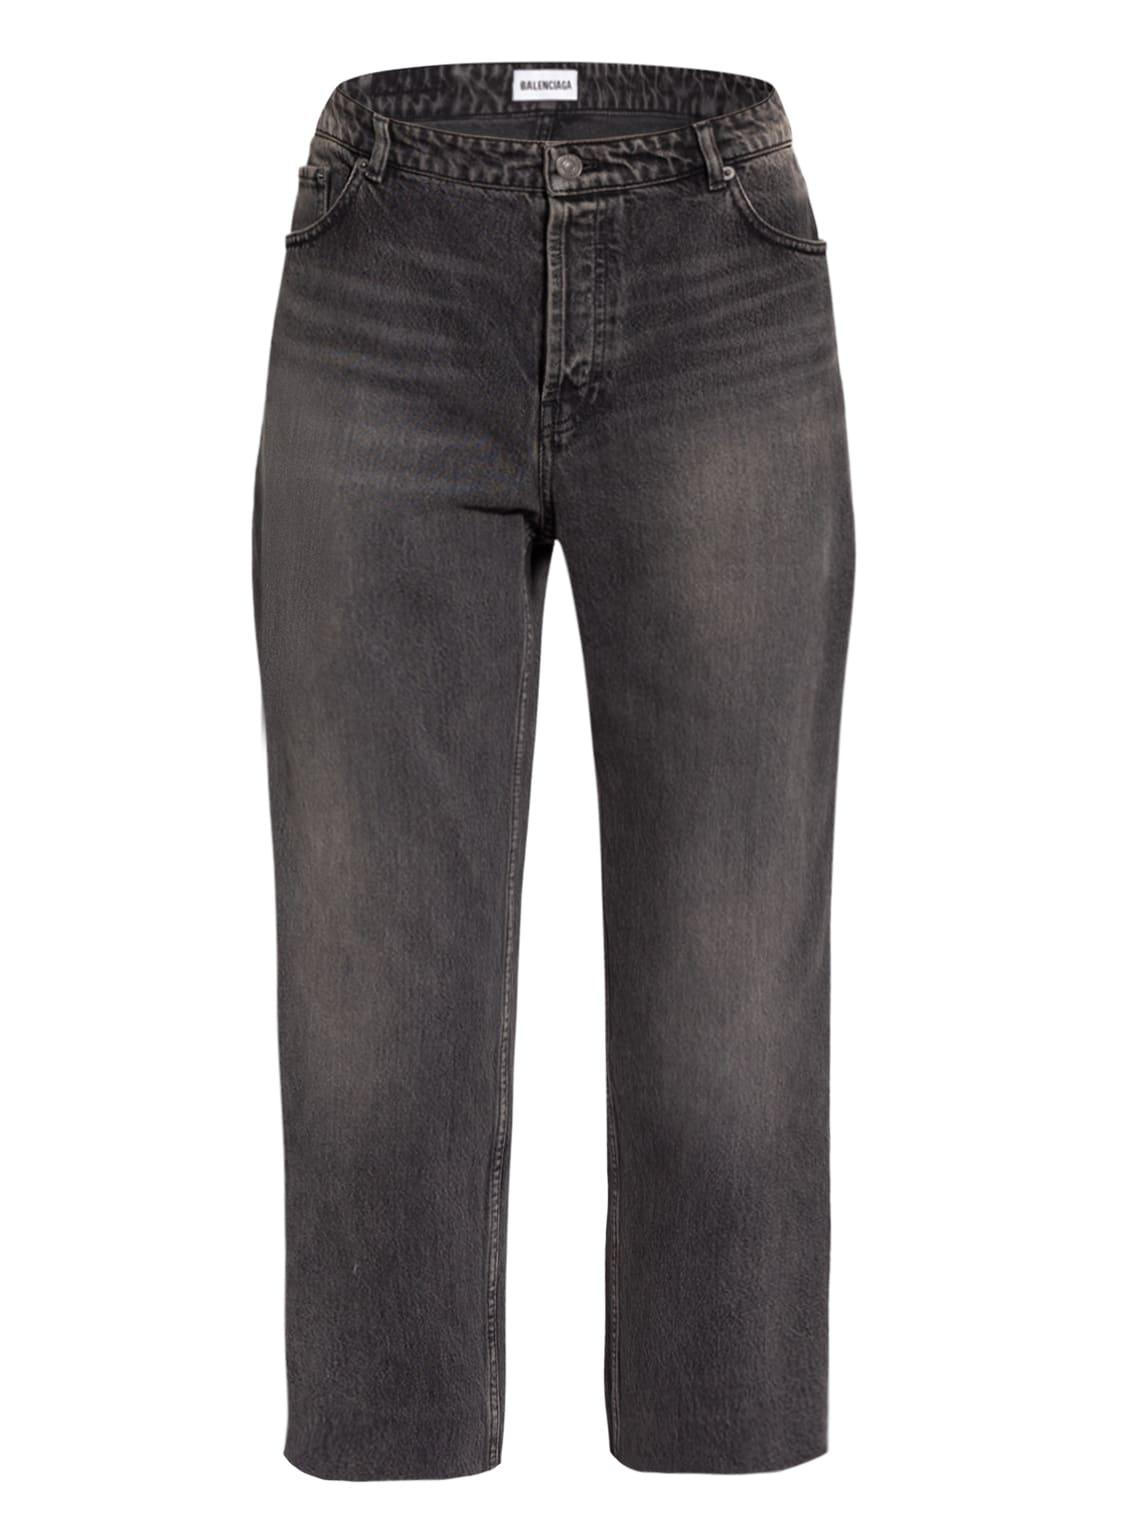 Image of Balenciaga 7/8-Jeans grau